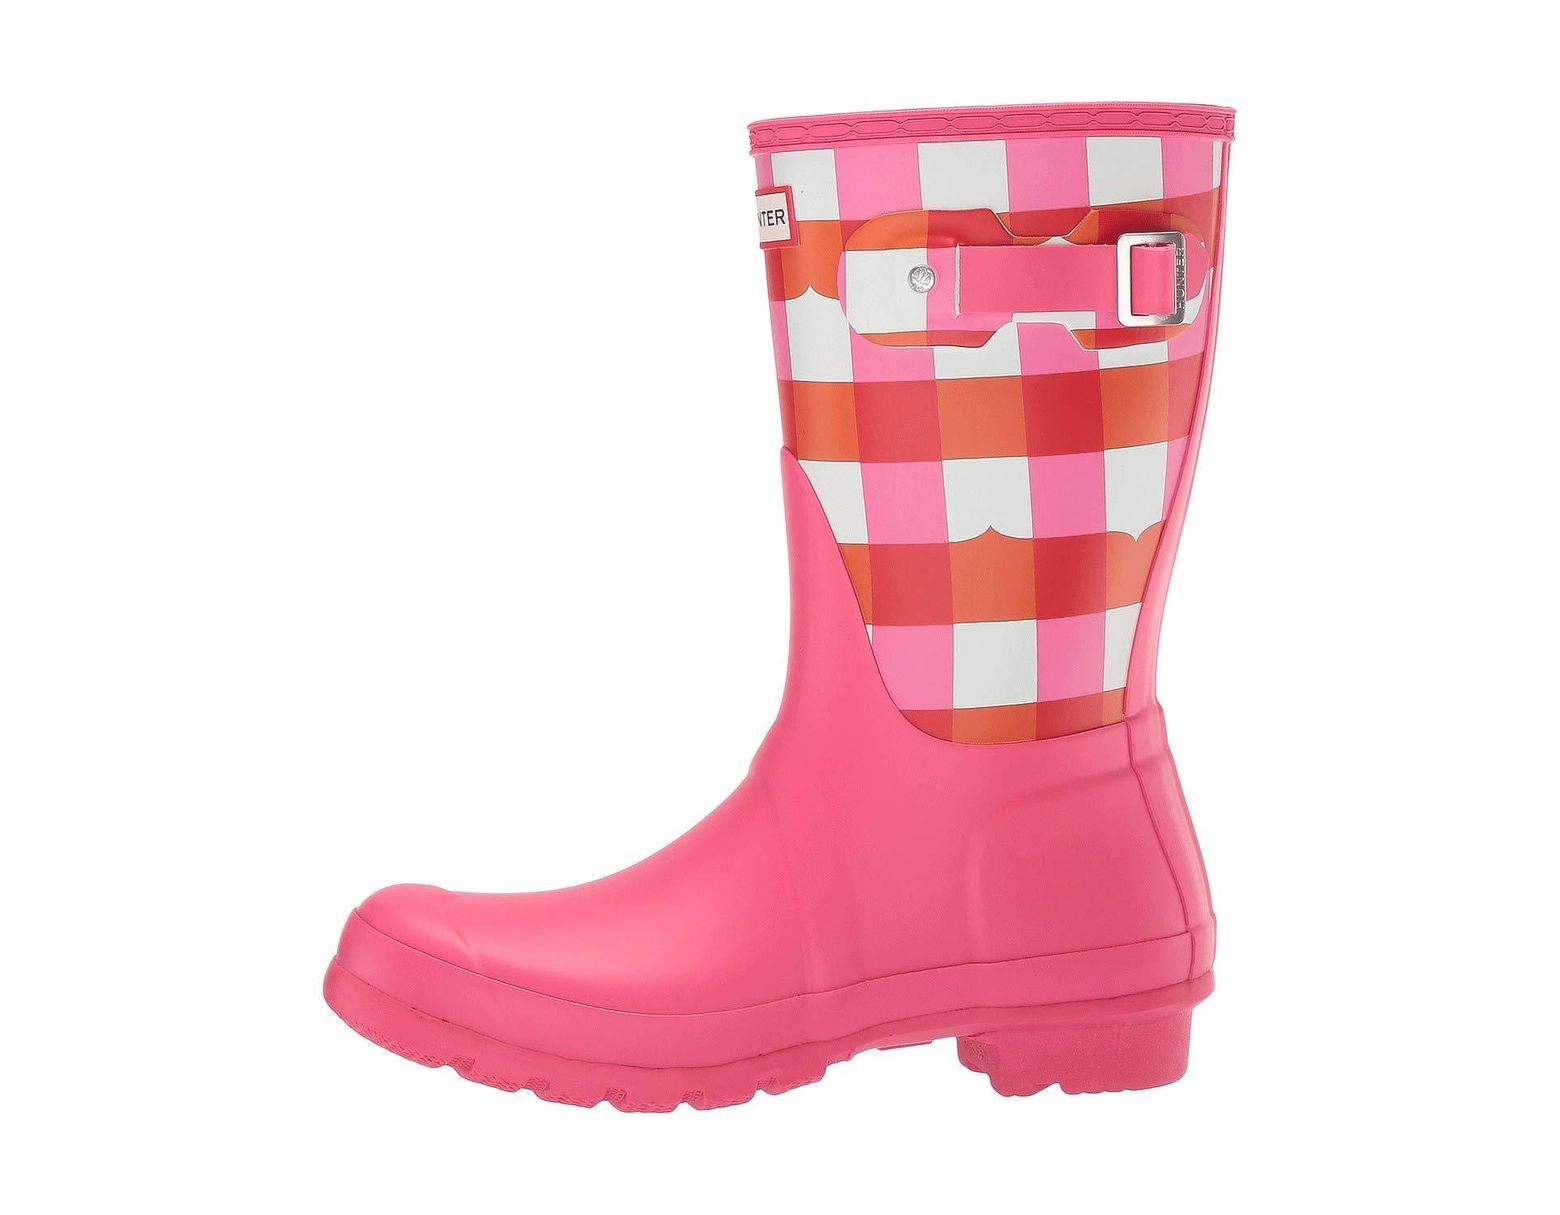 6610cc1a2104 Lyst - HUNTER Original Short Gingham (arcade Pink) Women s Rain Boots in  Pink